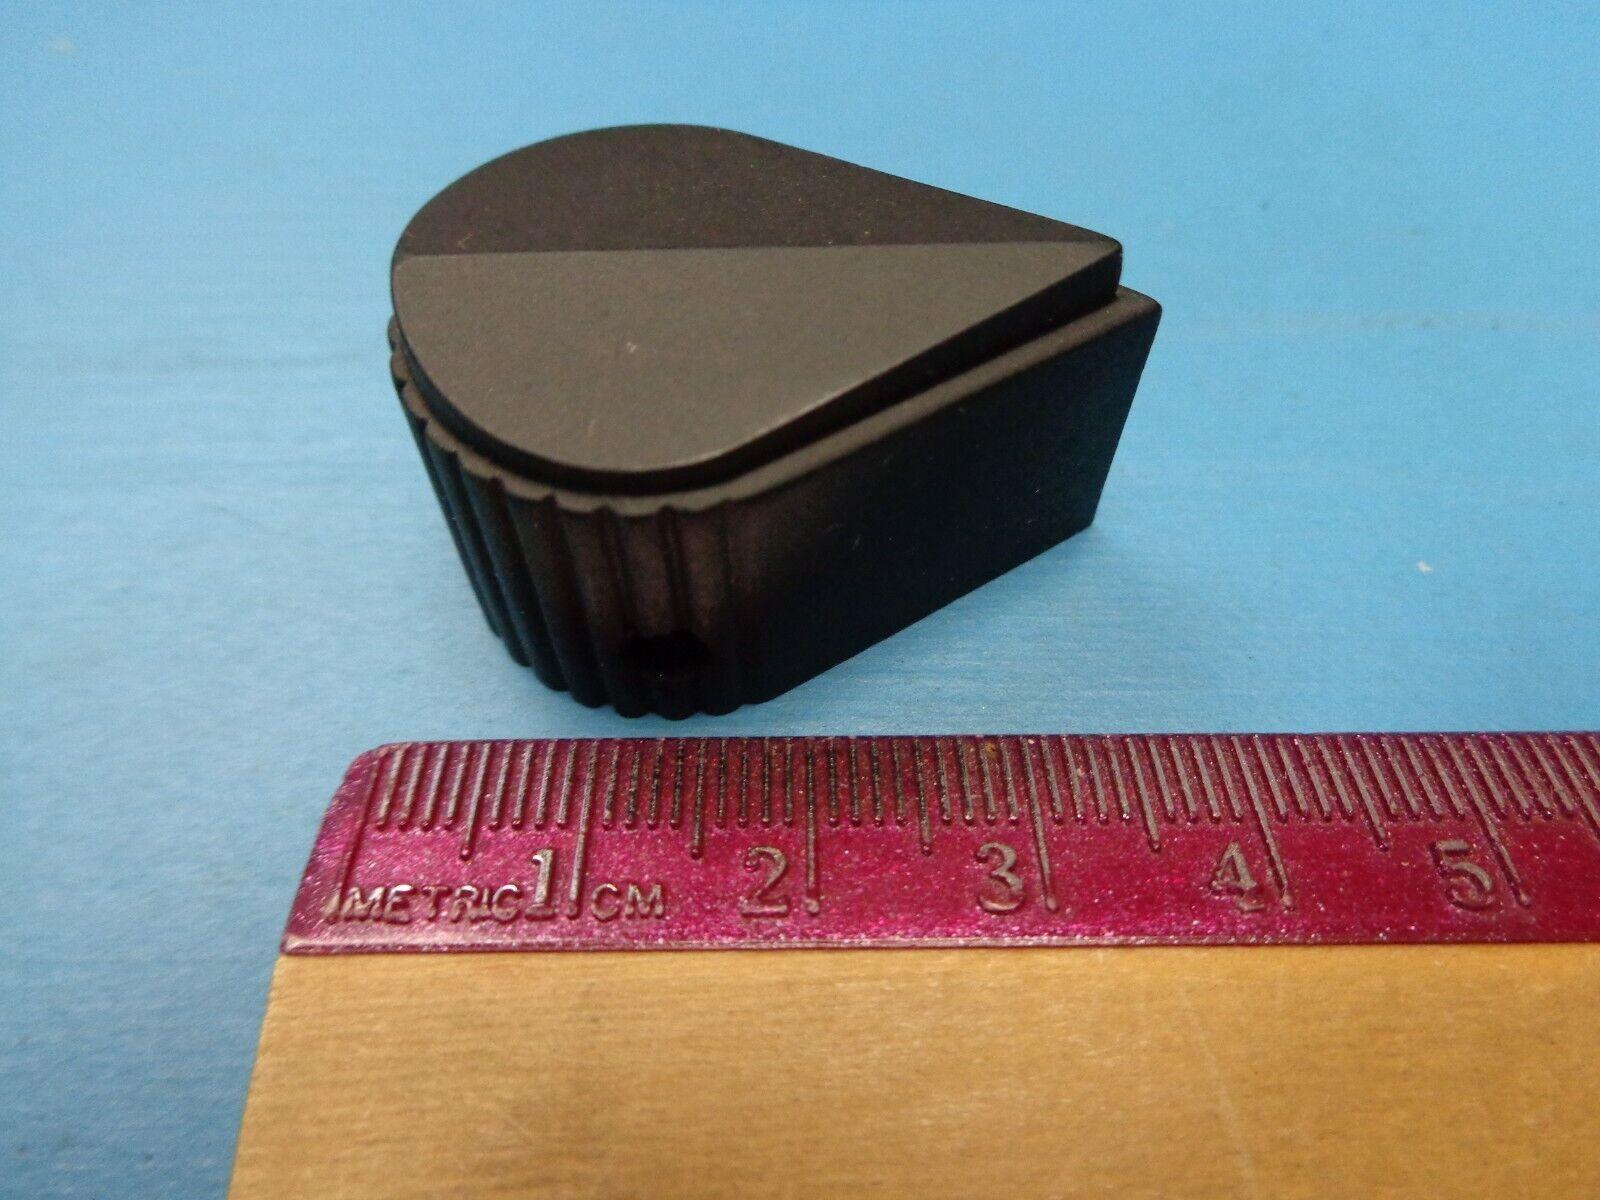 1 piece ELECTRONIC HARDWARE MS91528-1P2B POINTER BAR KNOB EHC 6.35MM